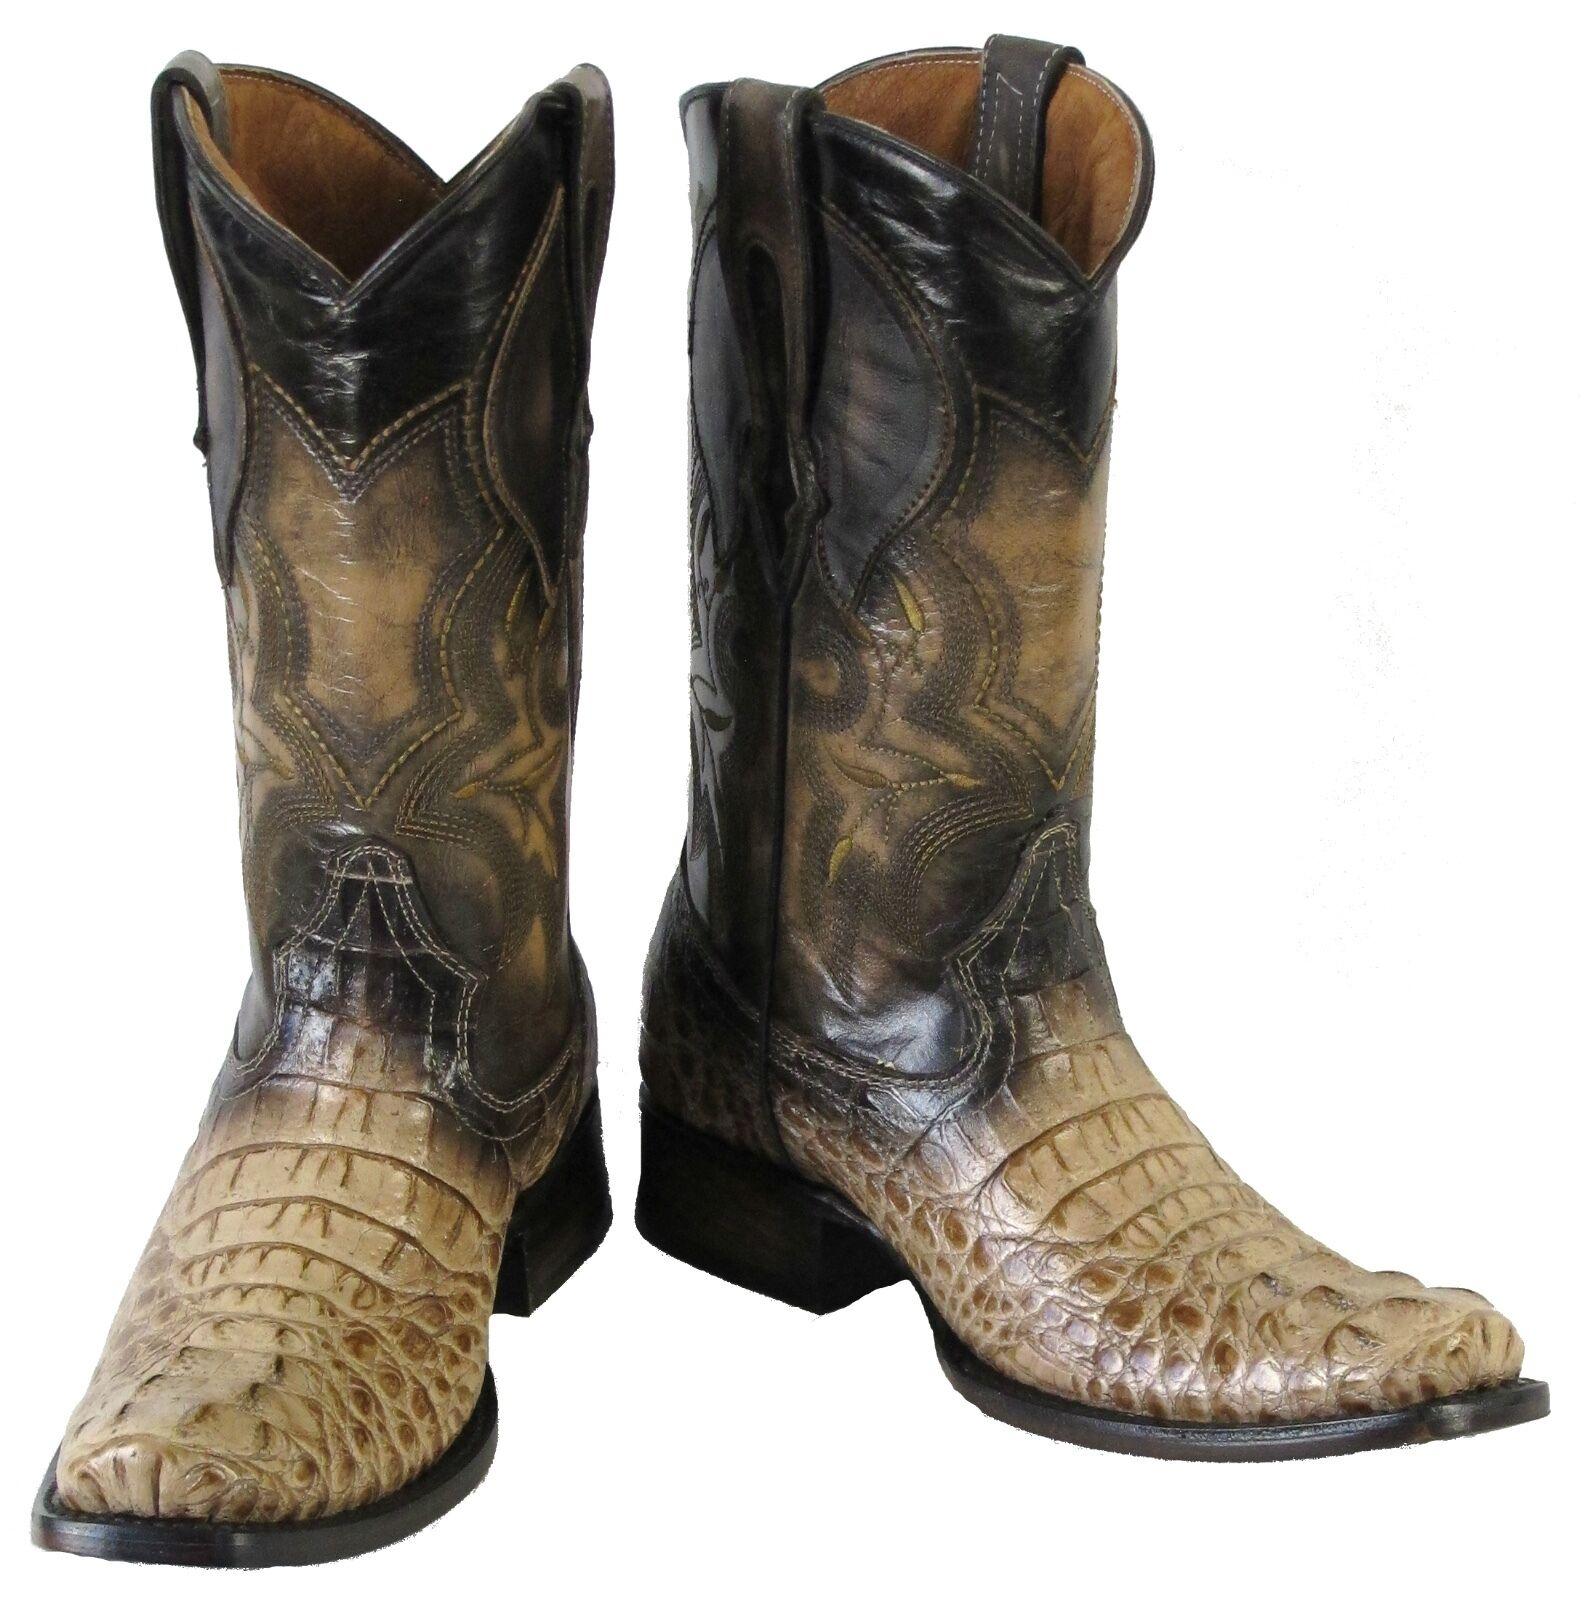 Men's Crocodile Head Design Leather Cowboy Western Square Boots Sand